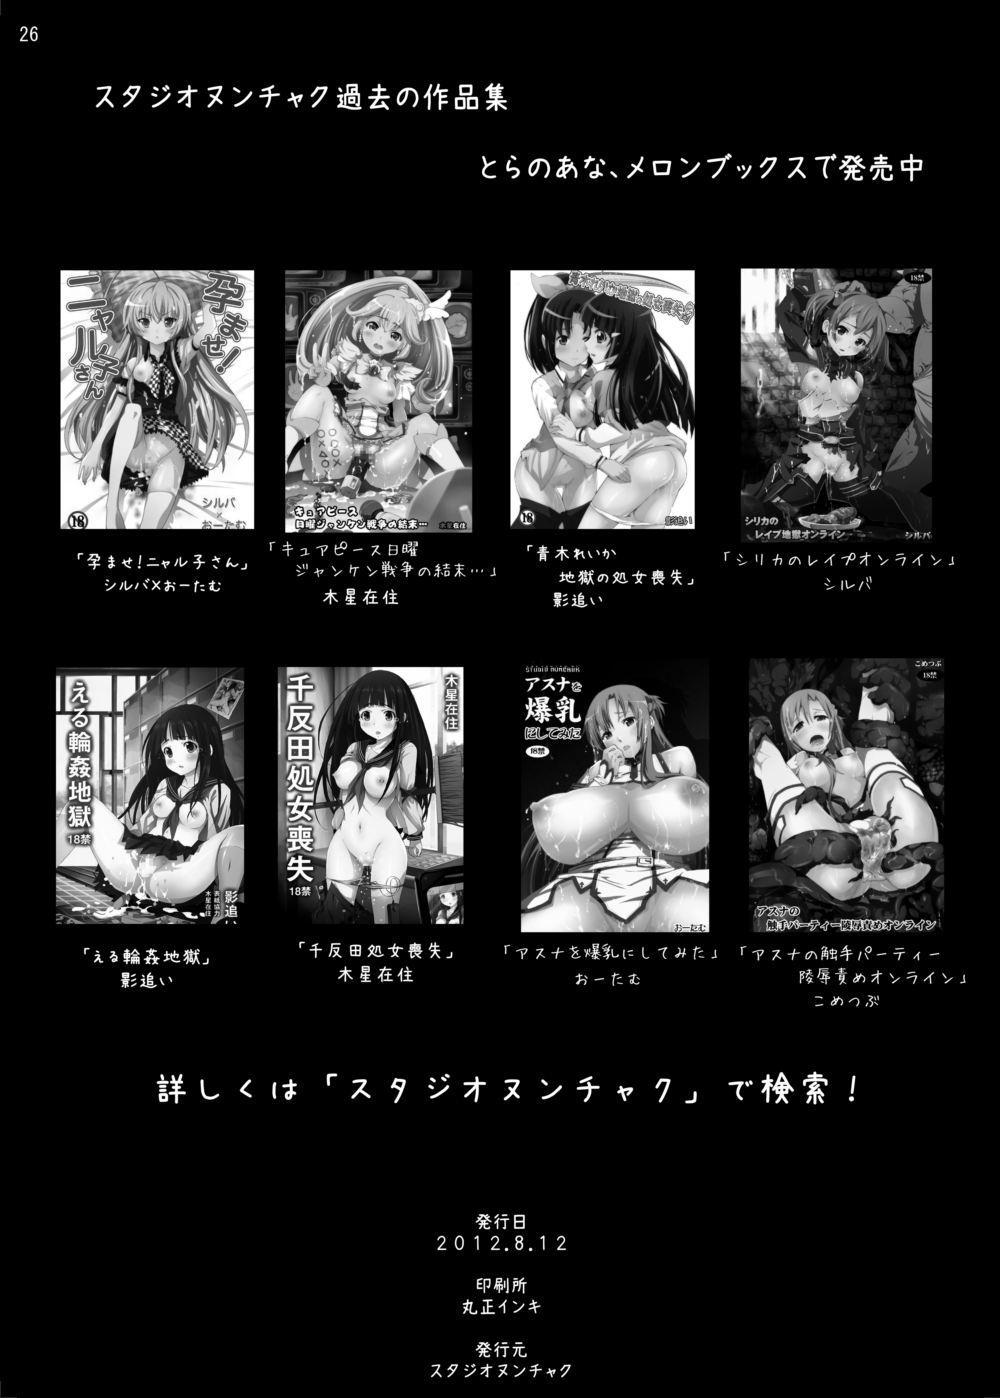 Asuna o Bakunyuu ni Shite Mita | I Gave Asuna Giant Tits 25